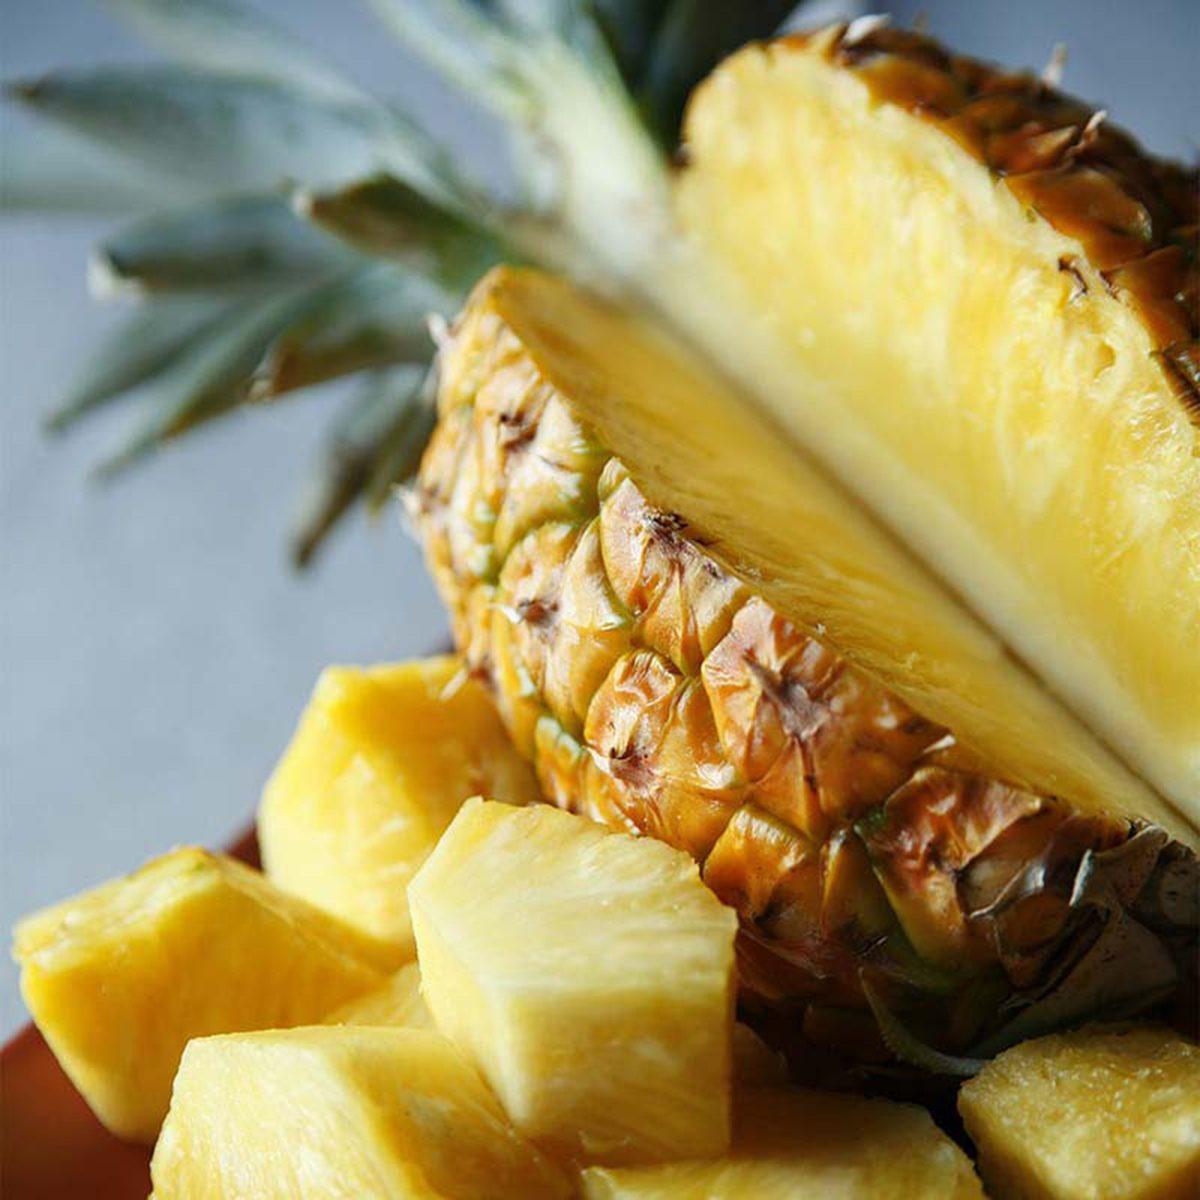 The Fruit Company: Pineapple Gift Basket